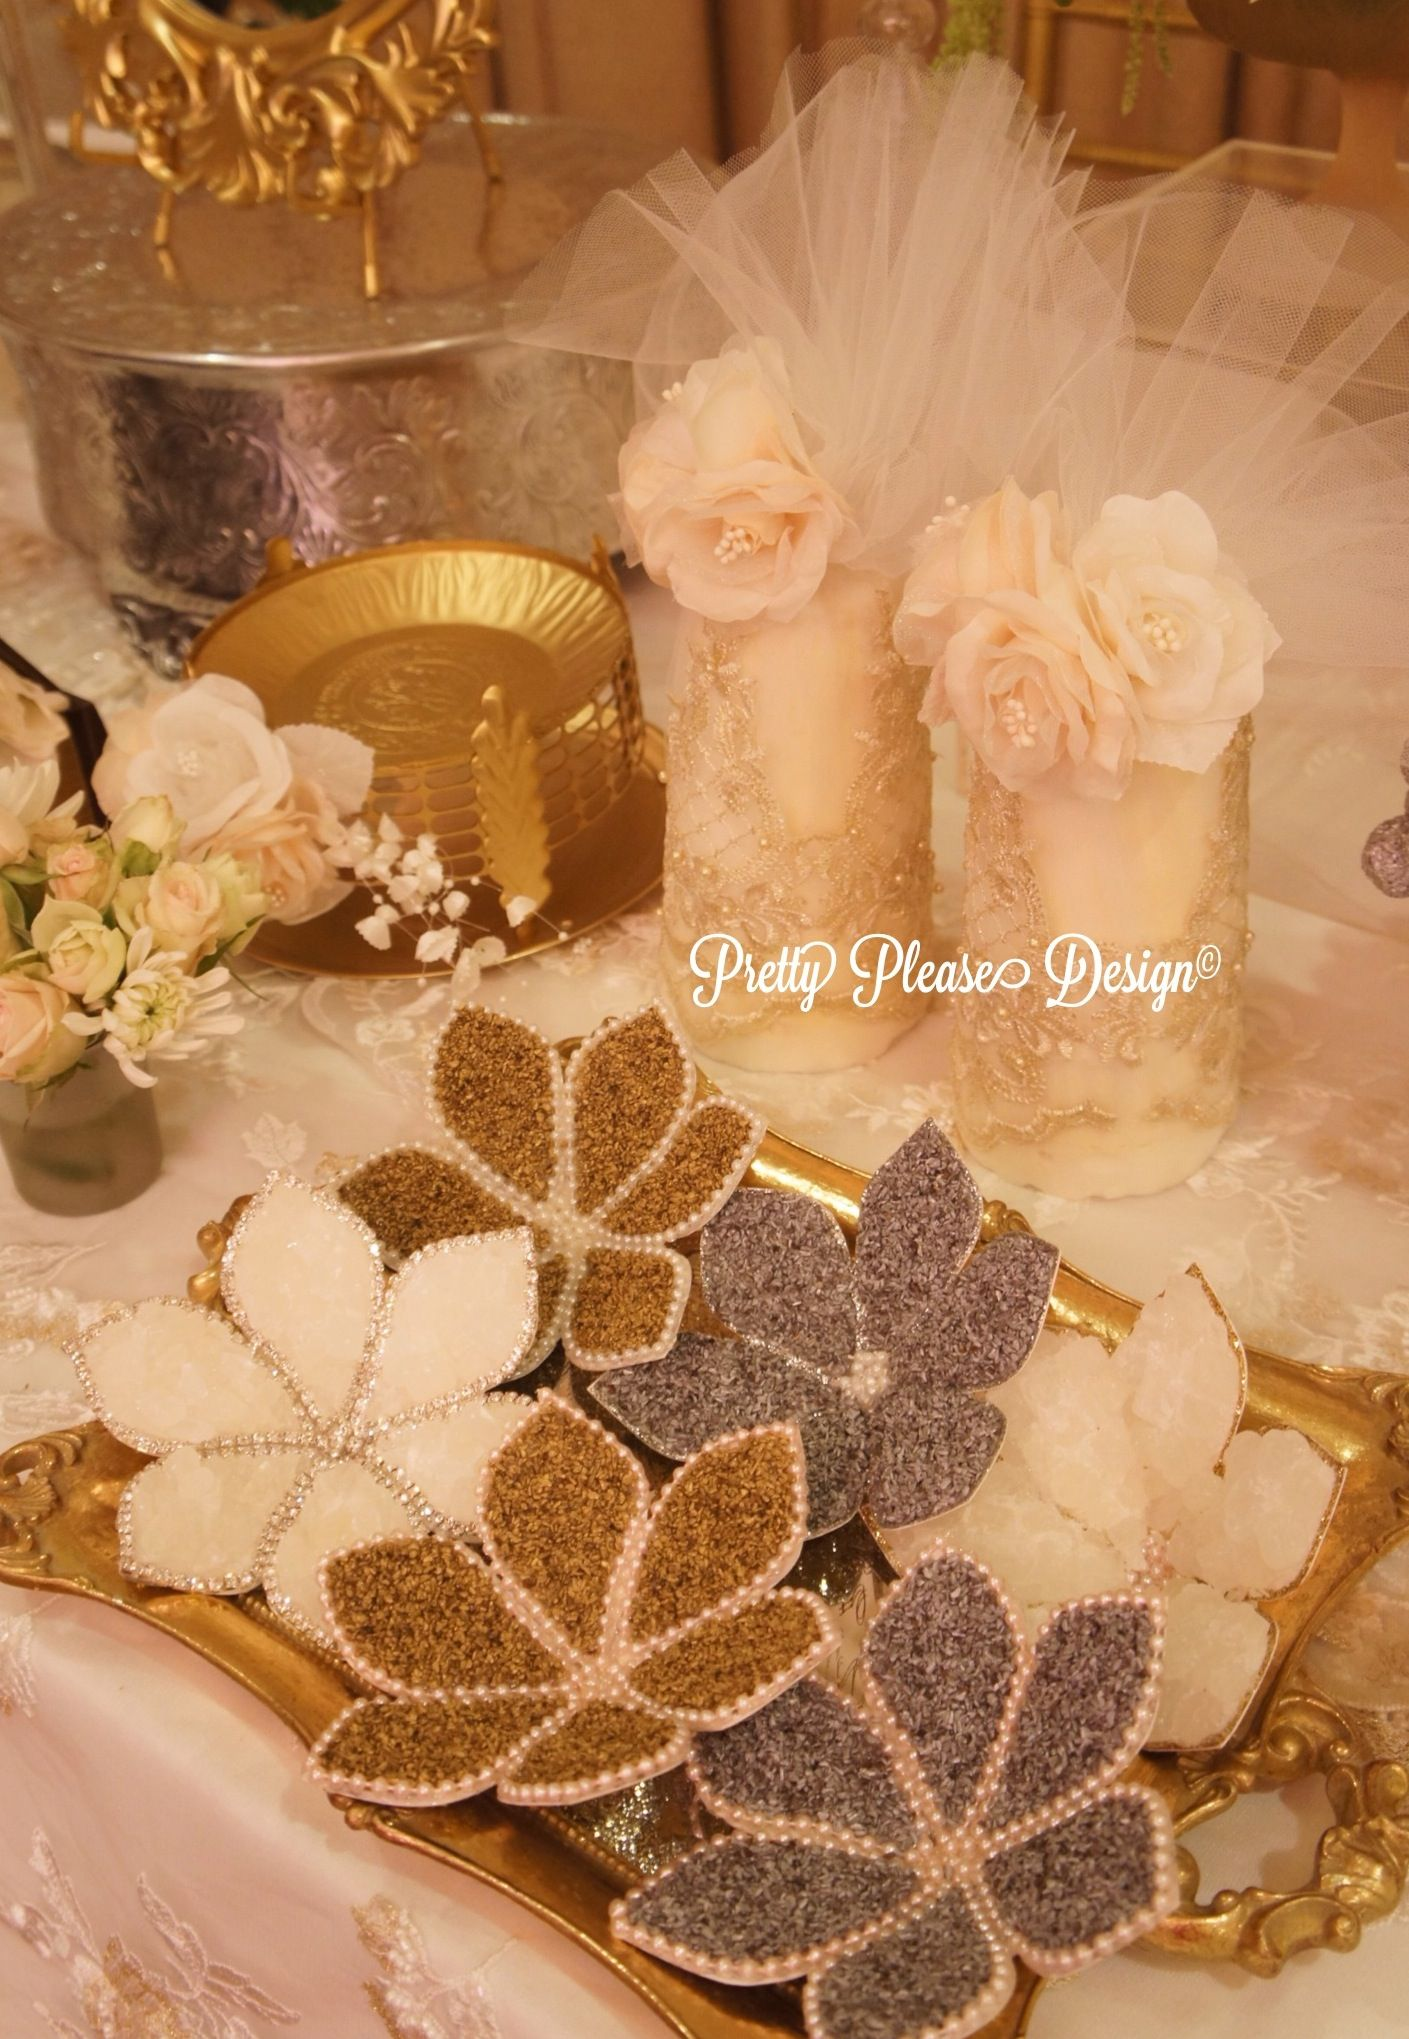 Pretty Please Design Sofreh Flowersgorgeous Ceremony